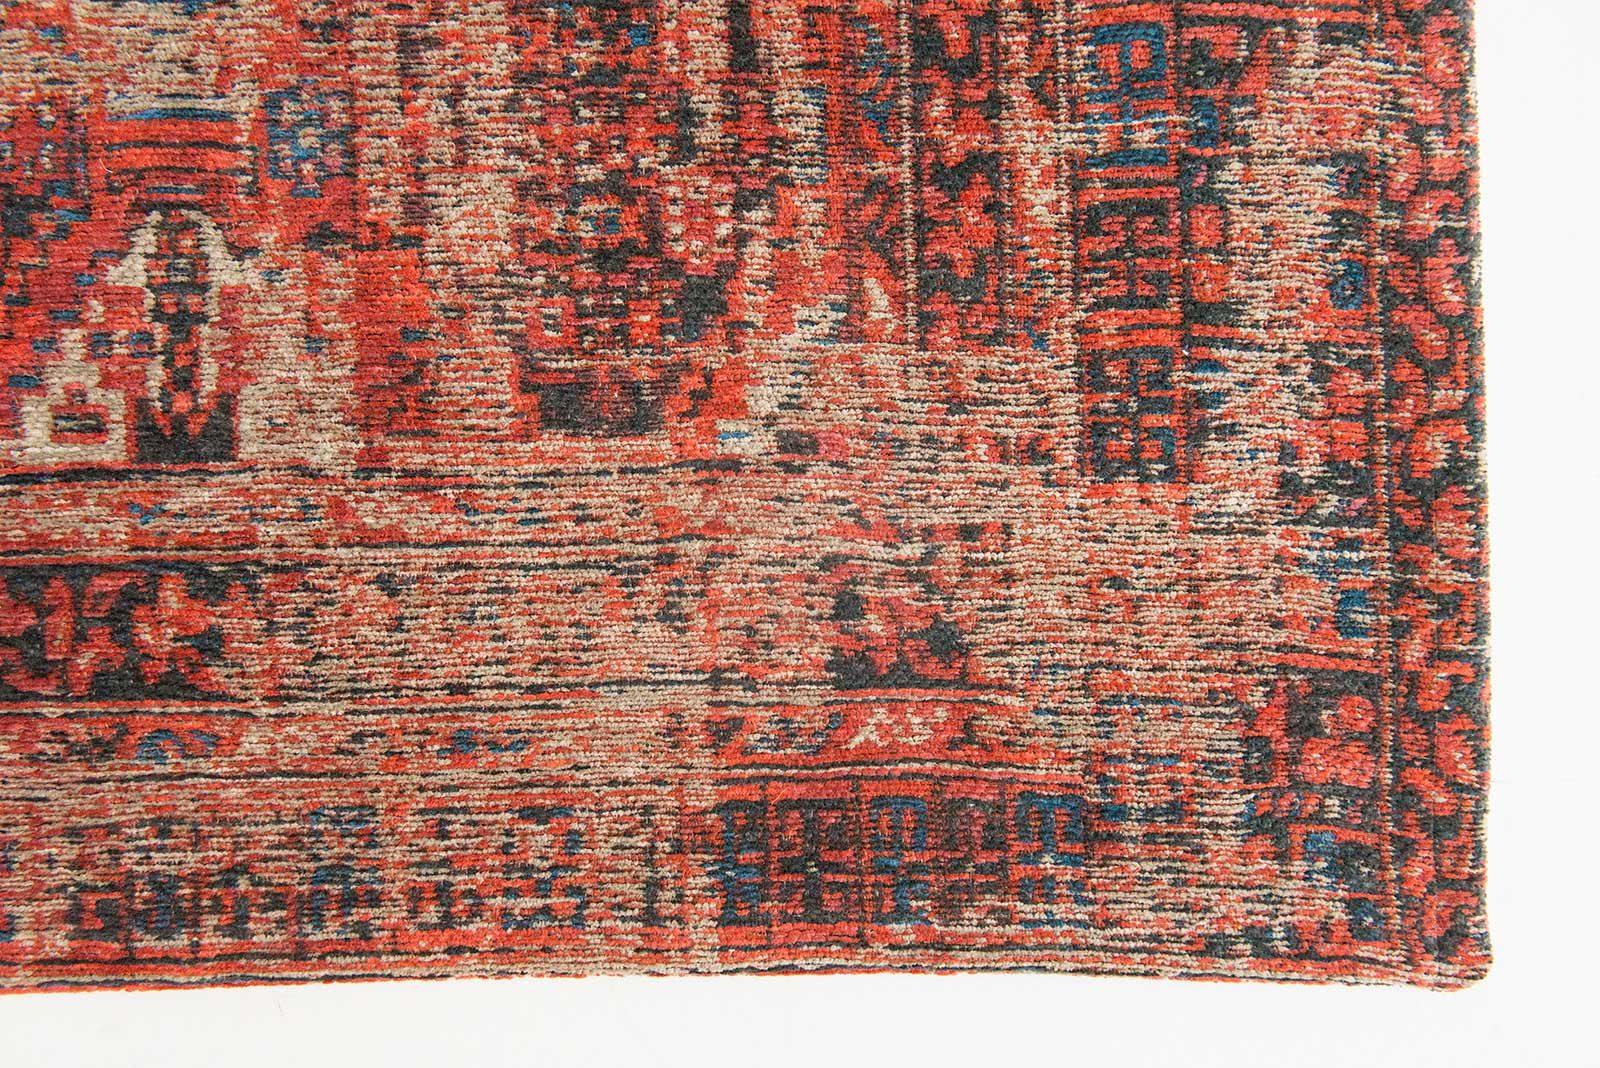 rugs Louis De Poortere LX8719 Antiquarian Antique Hadschlu 782 Red corner